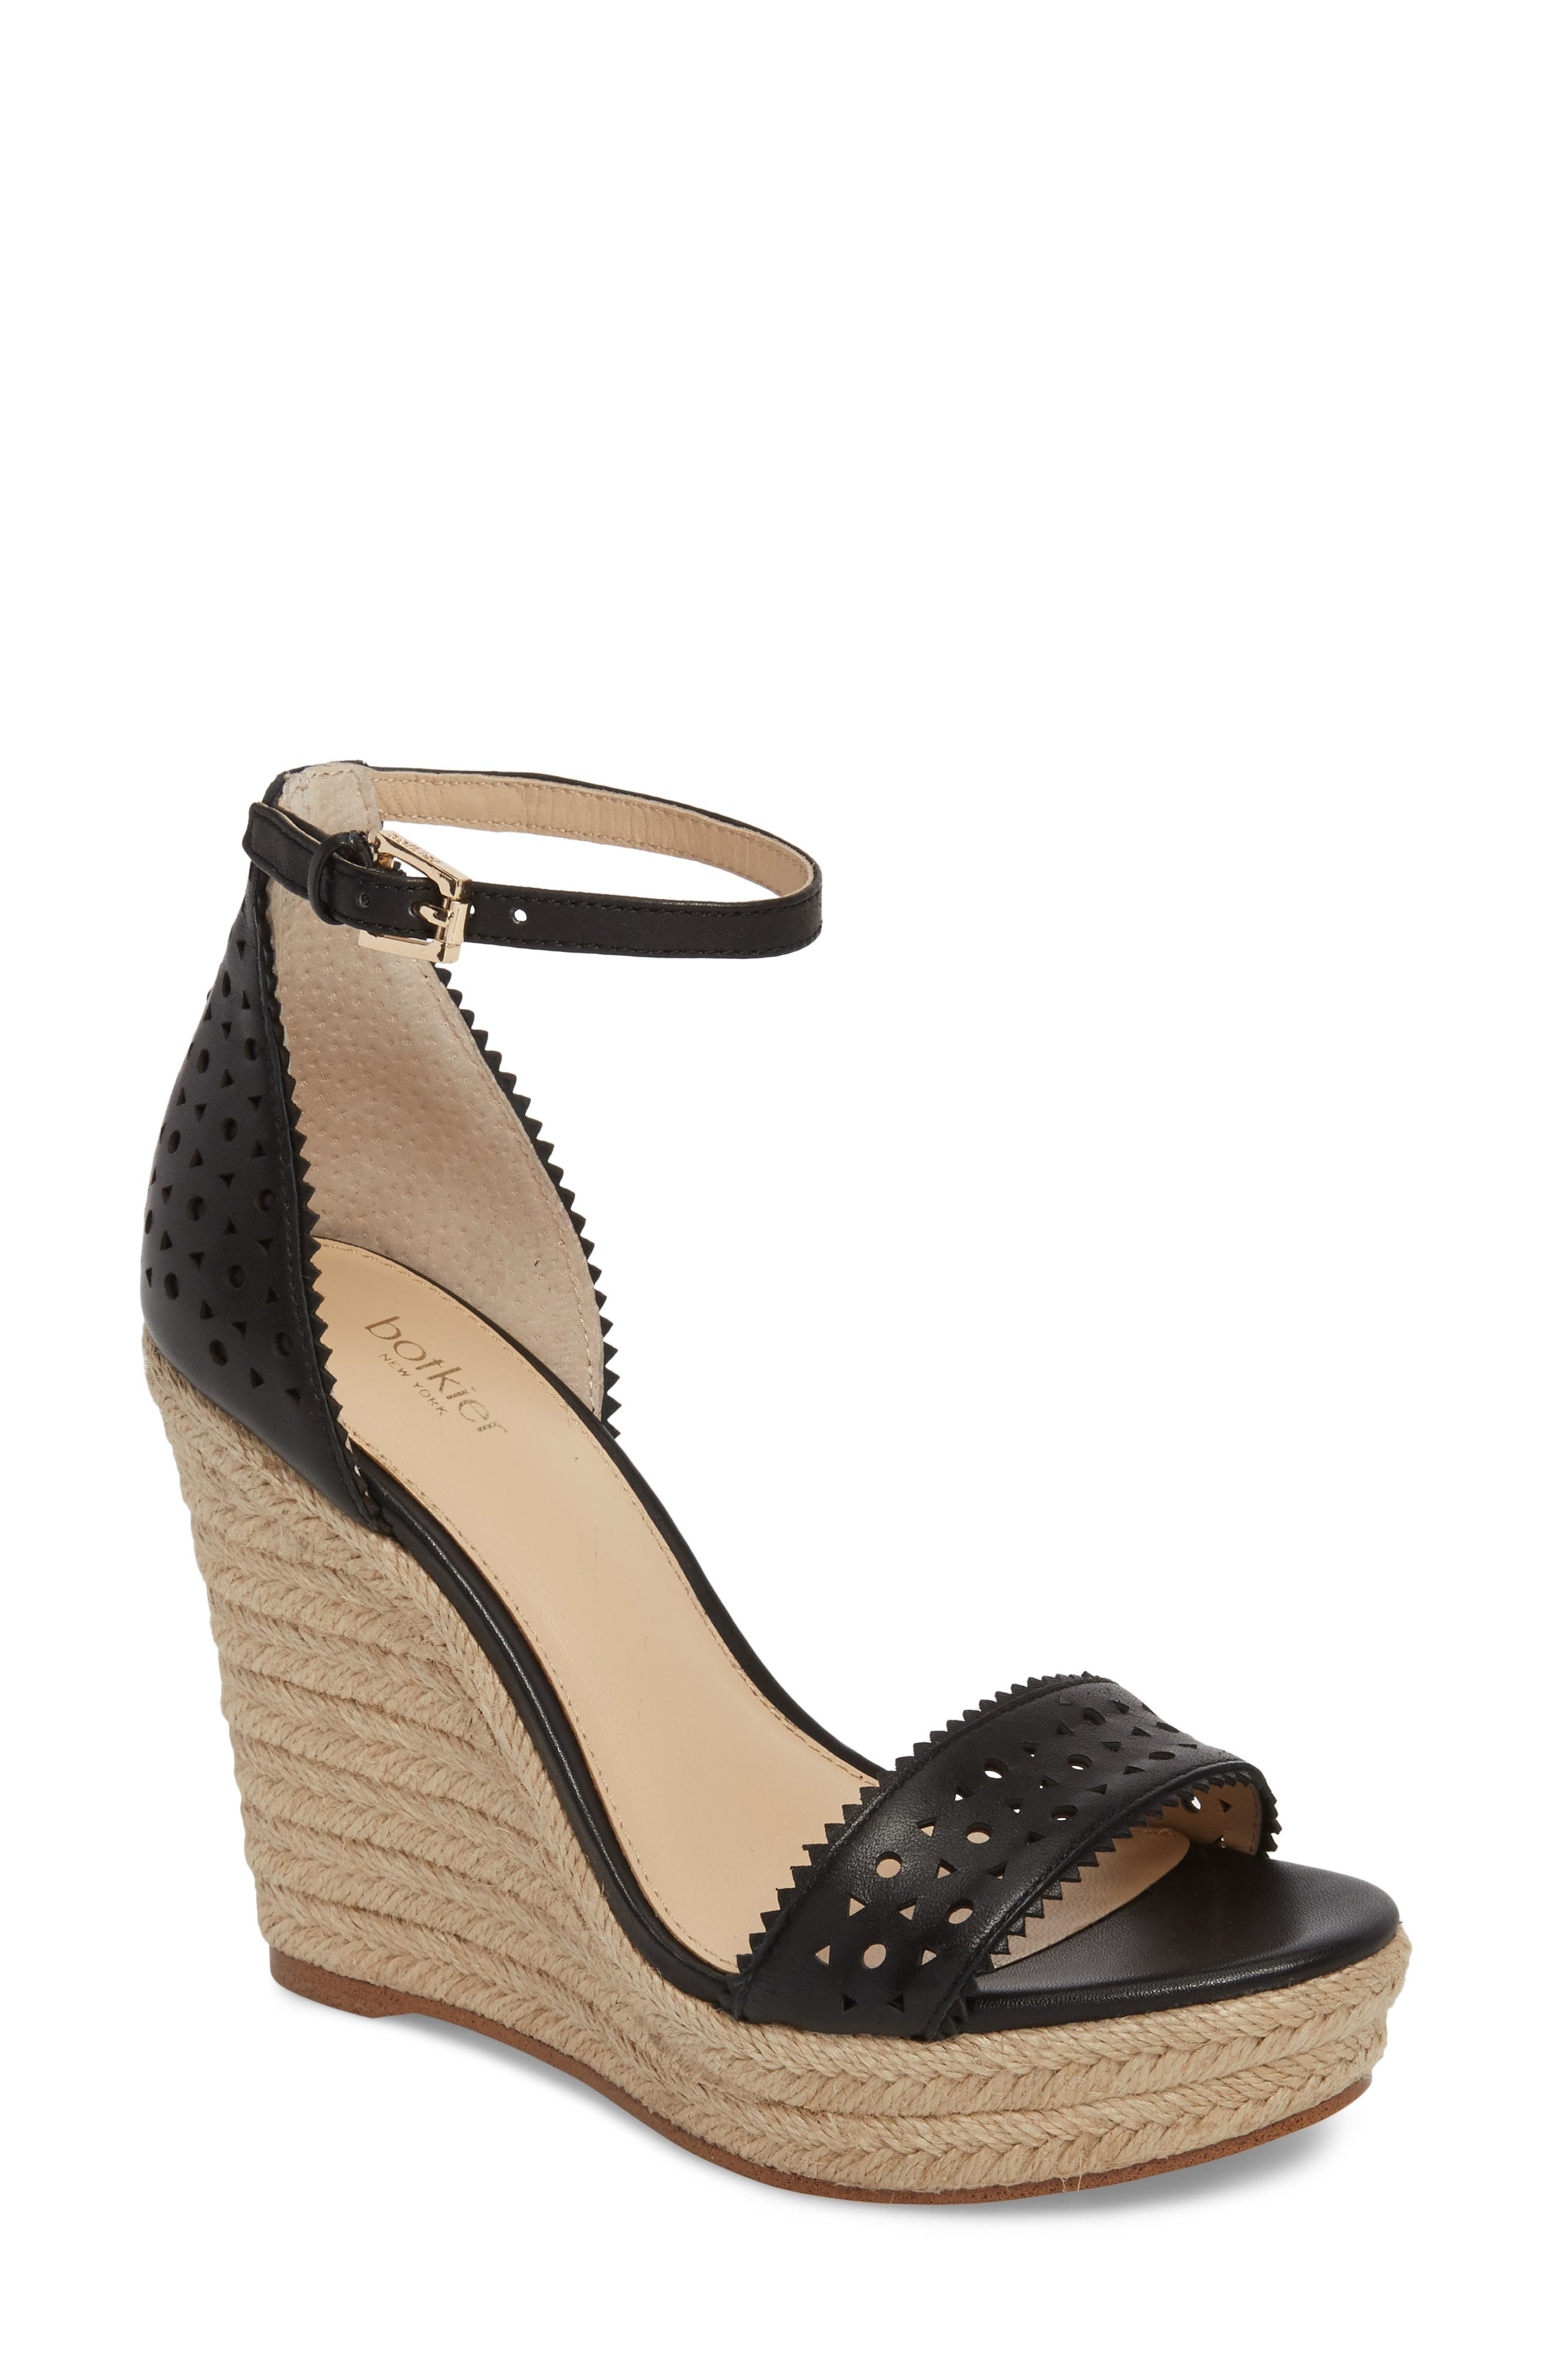 Jamie Espadrille Wedge Sandal,                         Main,                         color, BLACK LEATHER